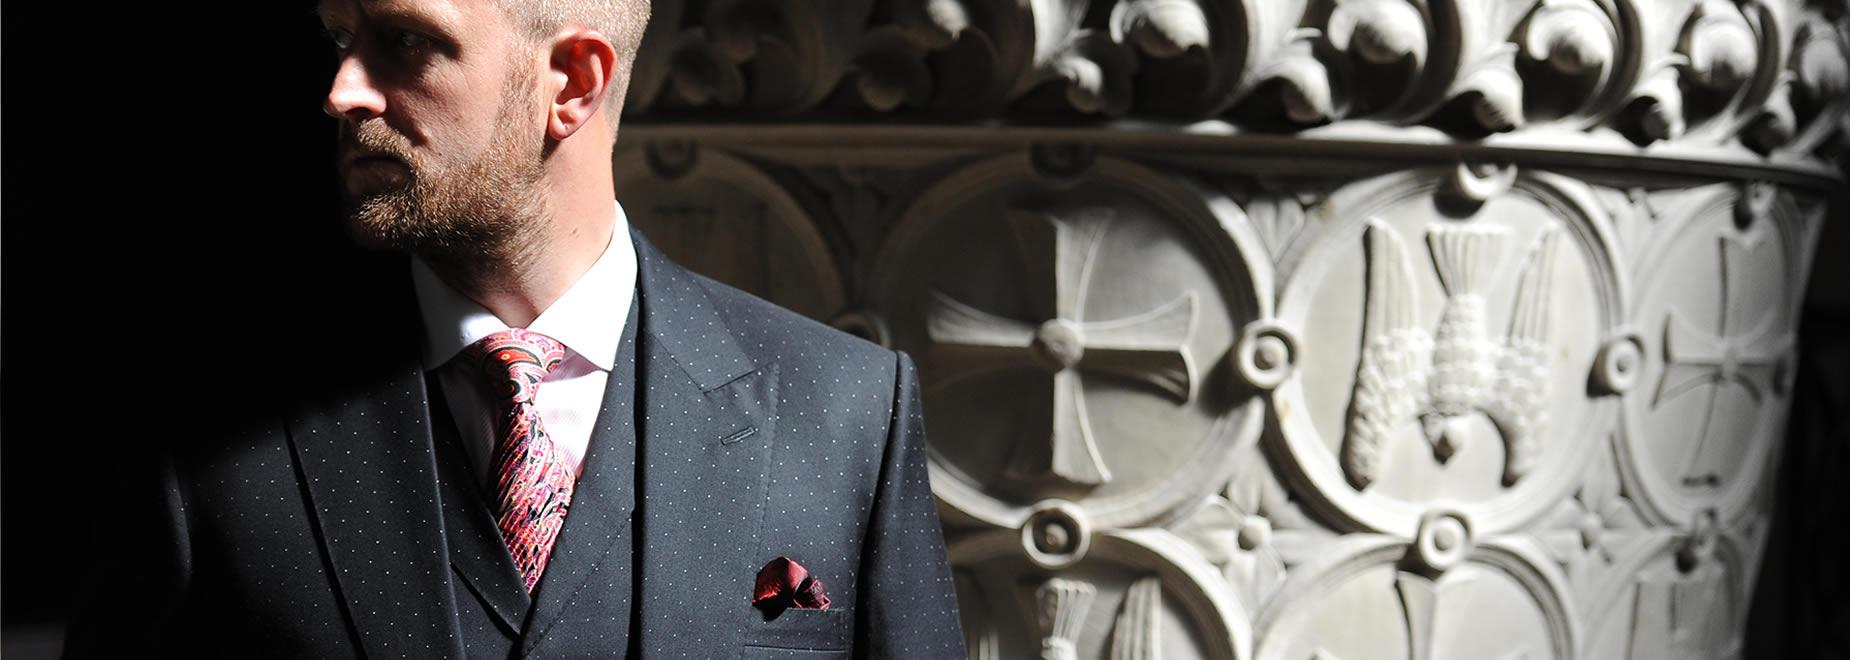 Bespoke Tailors Souster Hicks Wedding Suits Savile Row